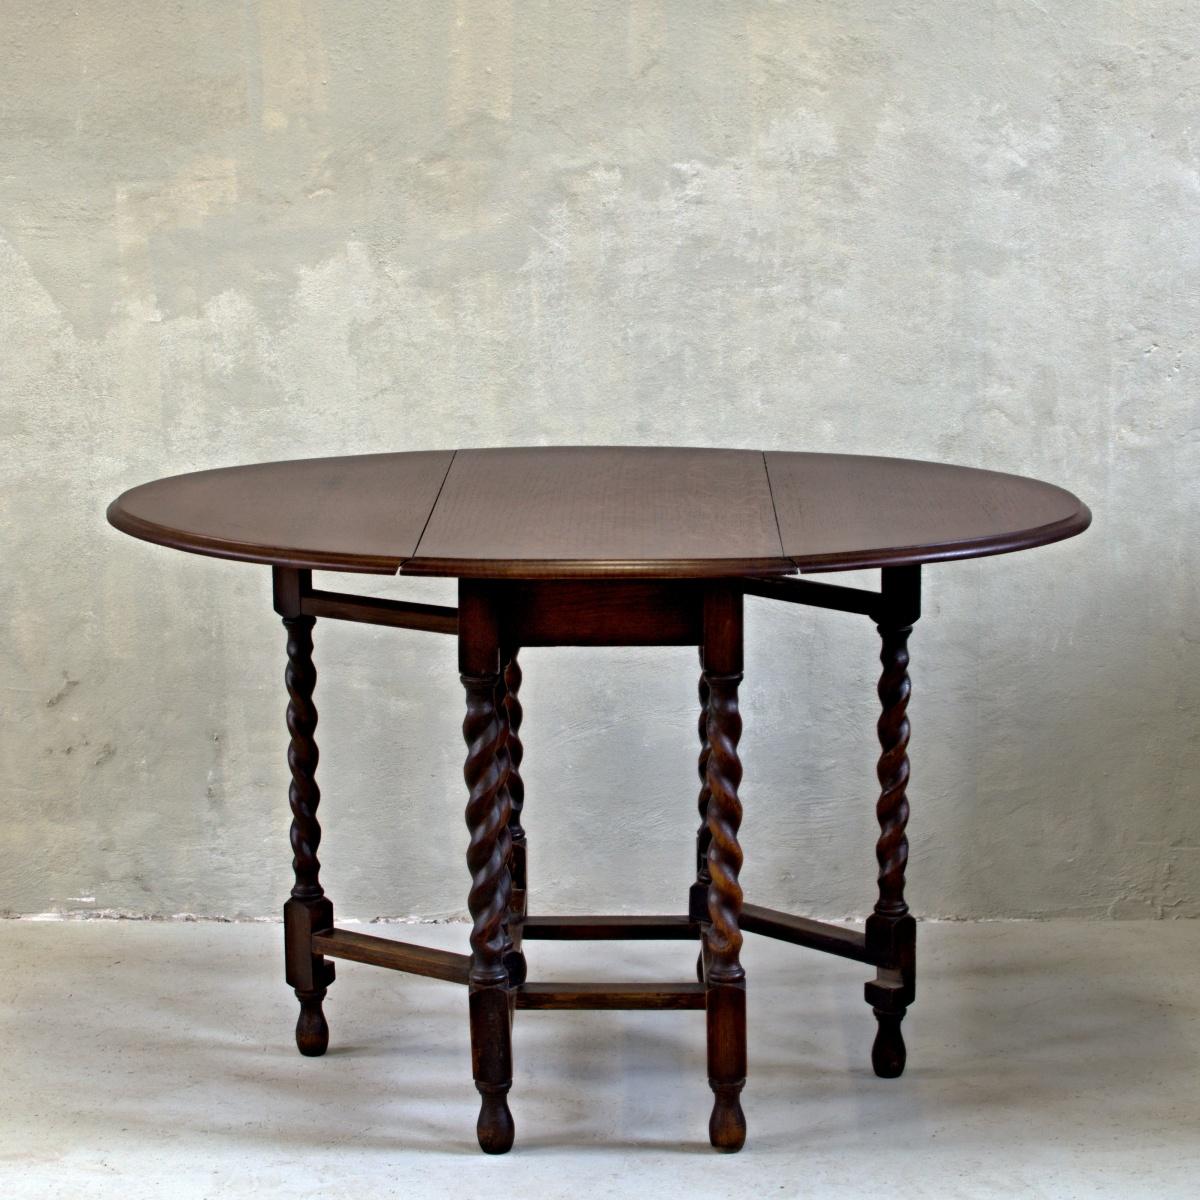 oválný rozkládací stůl barley twist anglický stylový vintage nábytek po celkové renovaci oživeno